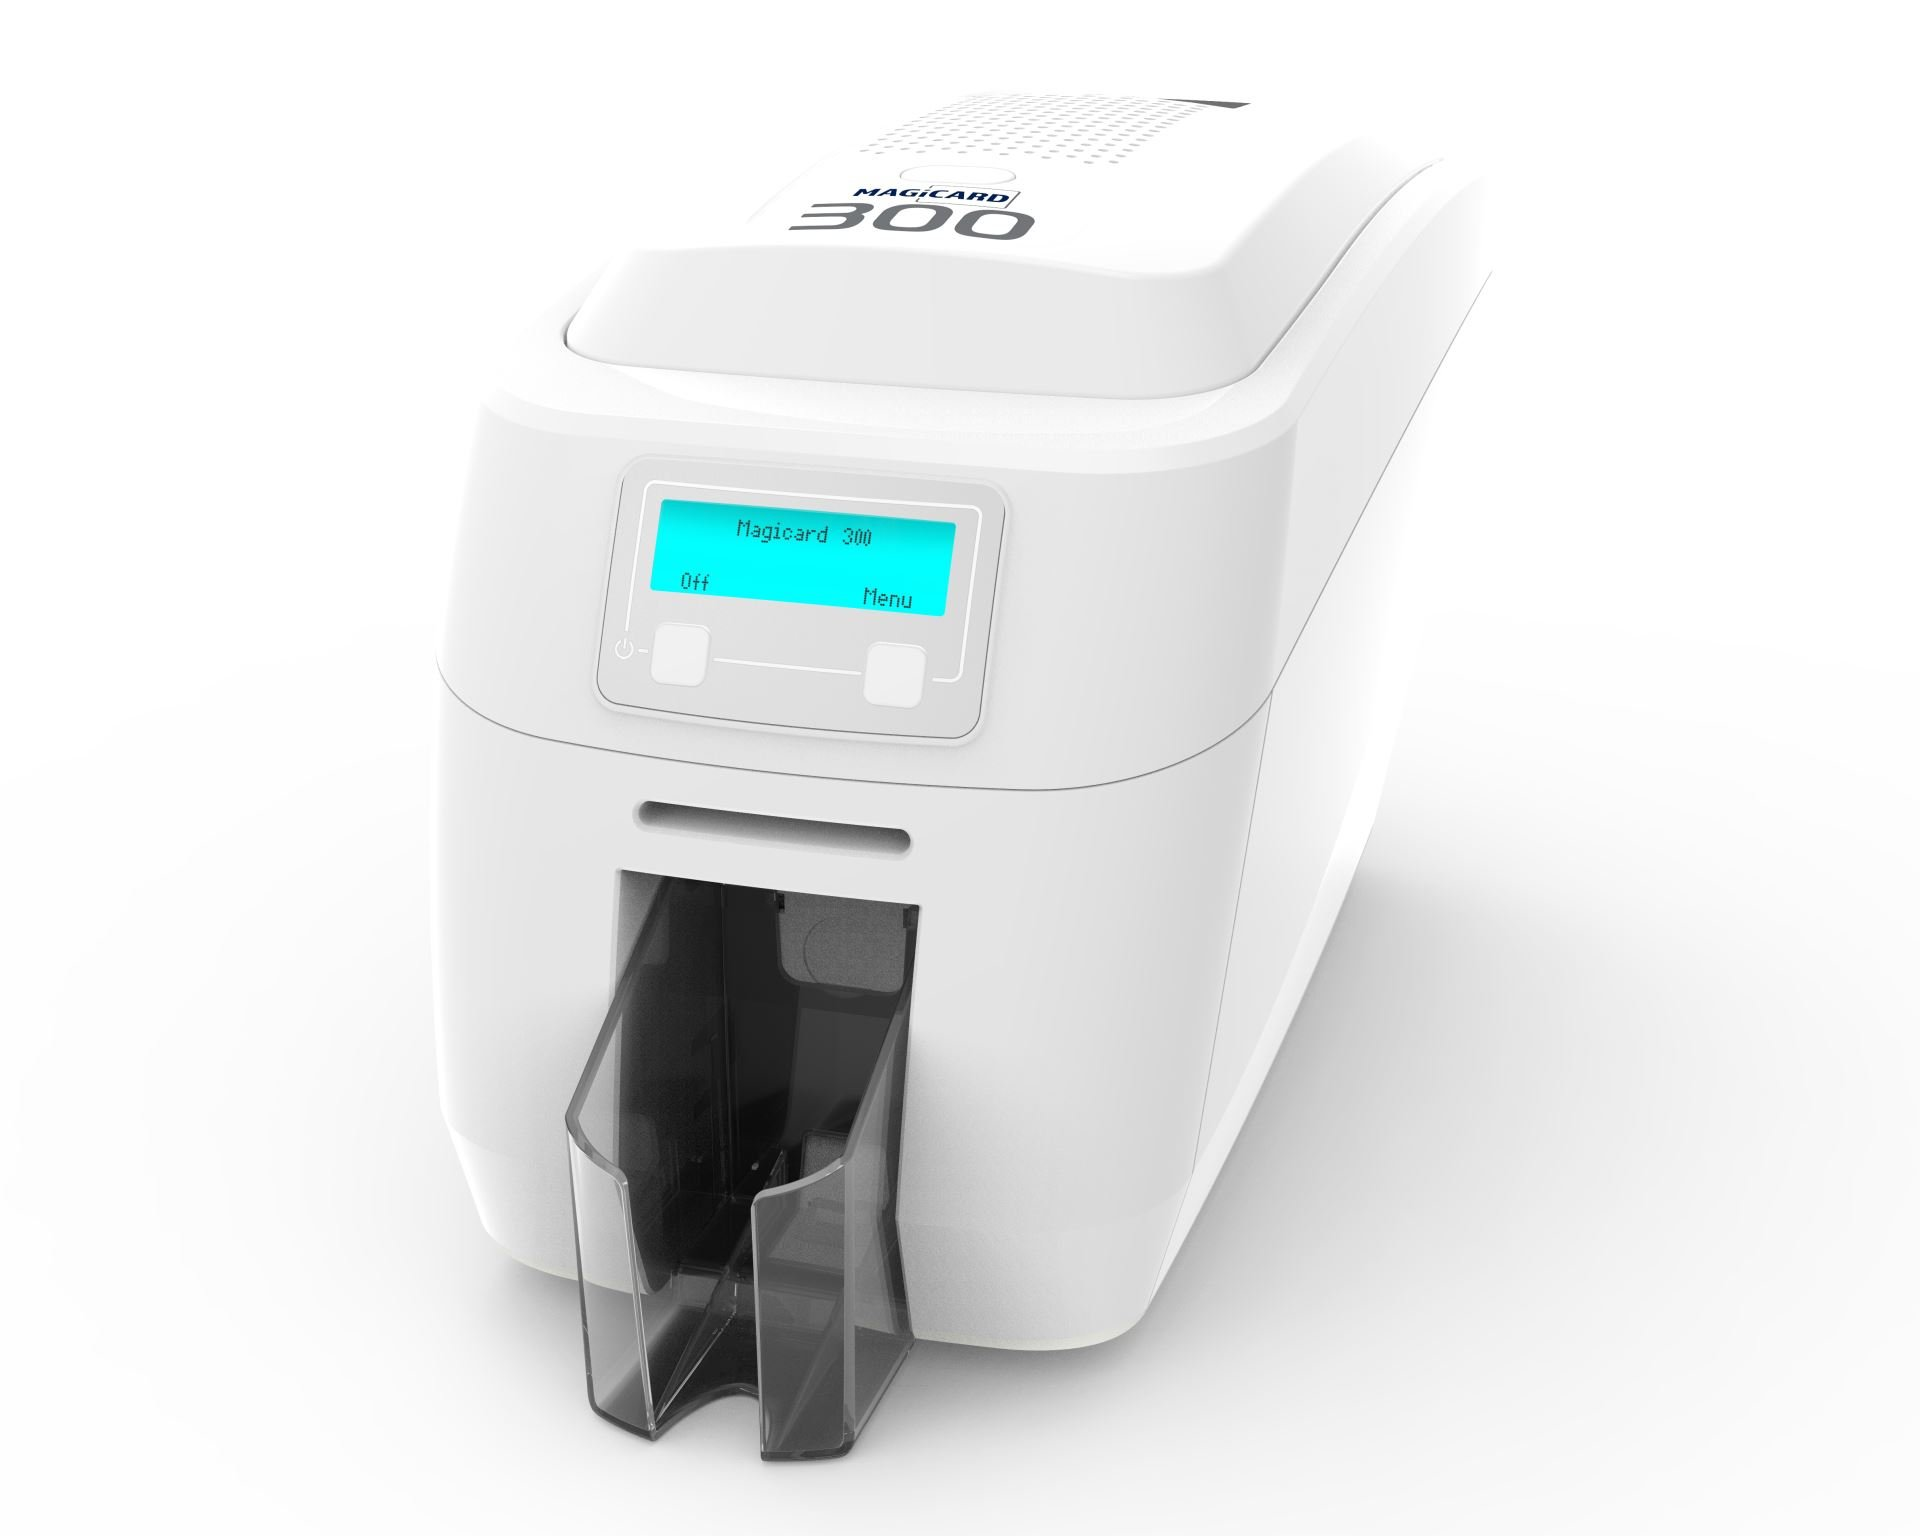 Magicard 300 ID Card Printer 3300-0021 (Dual Sided)